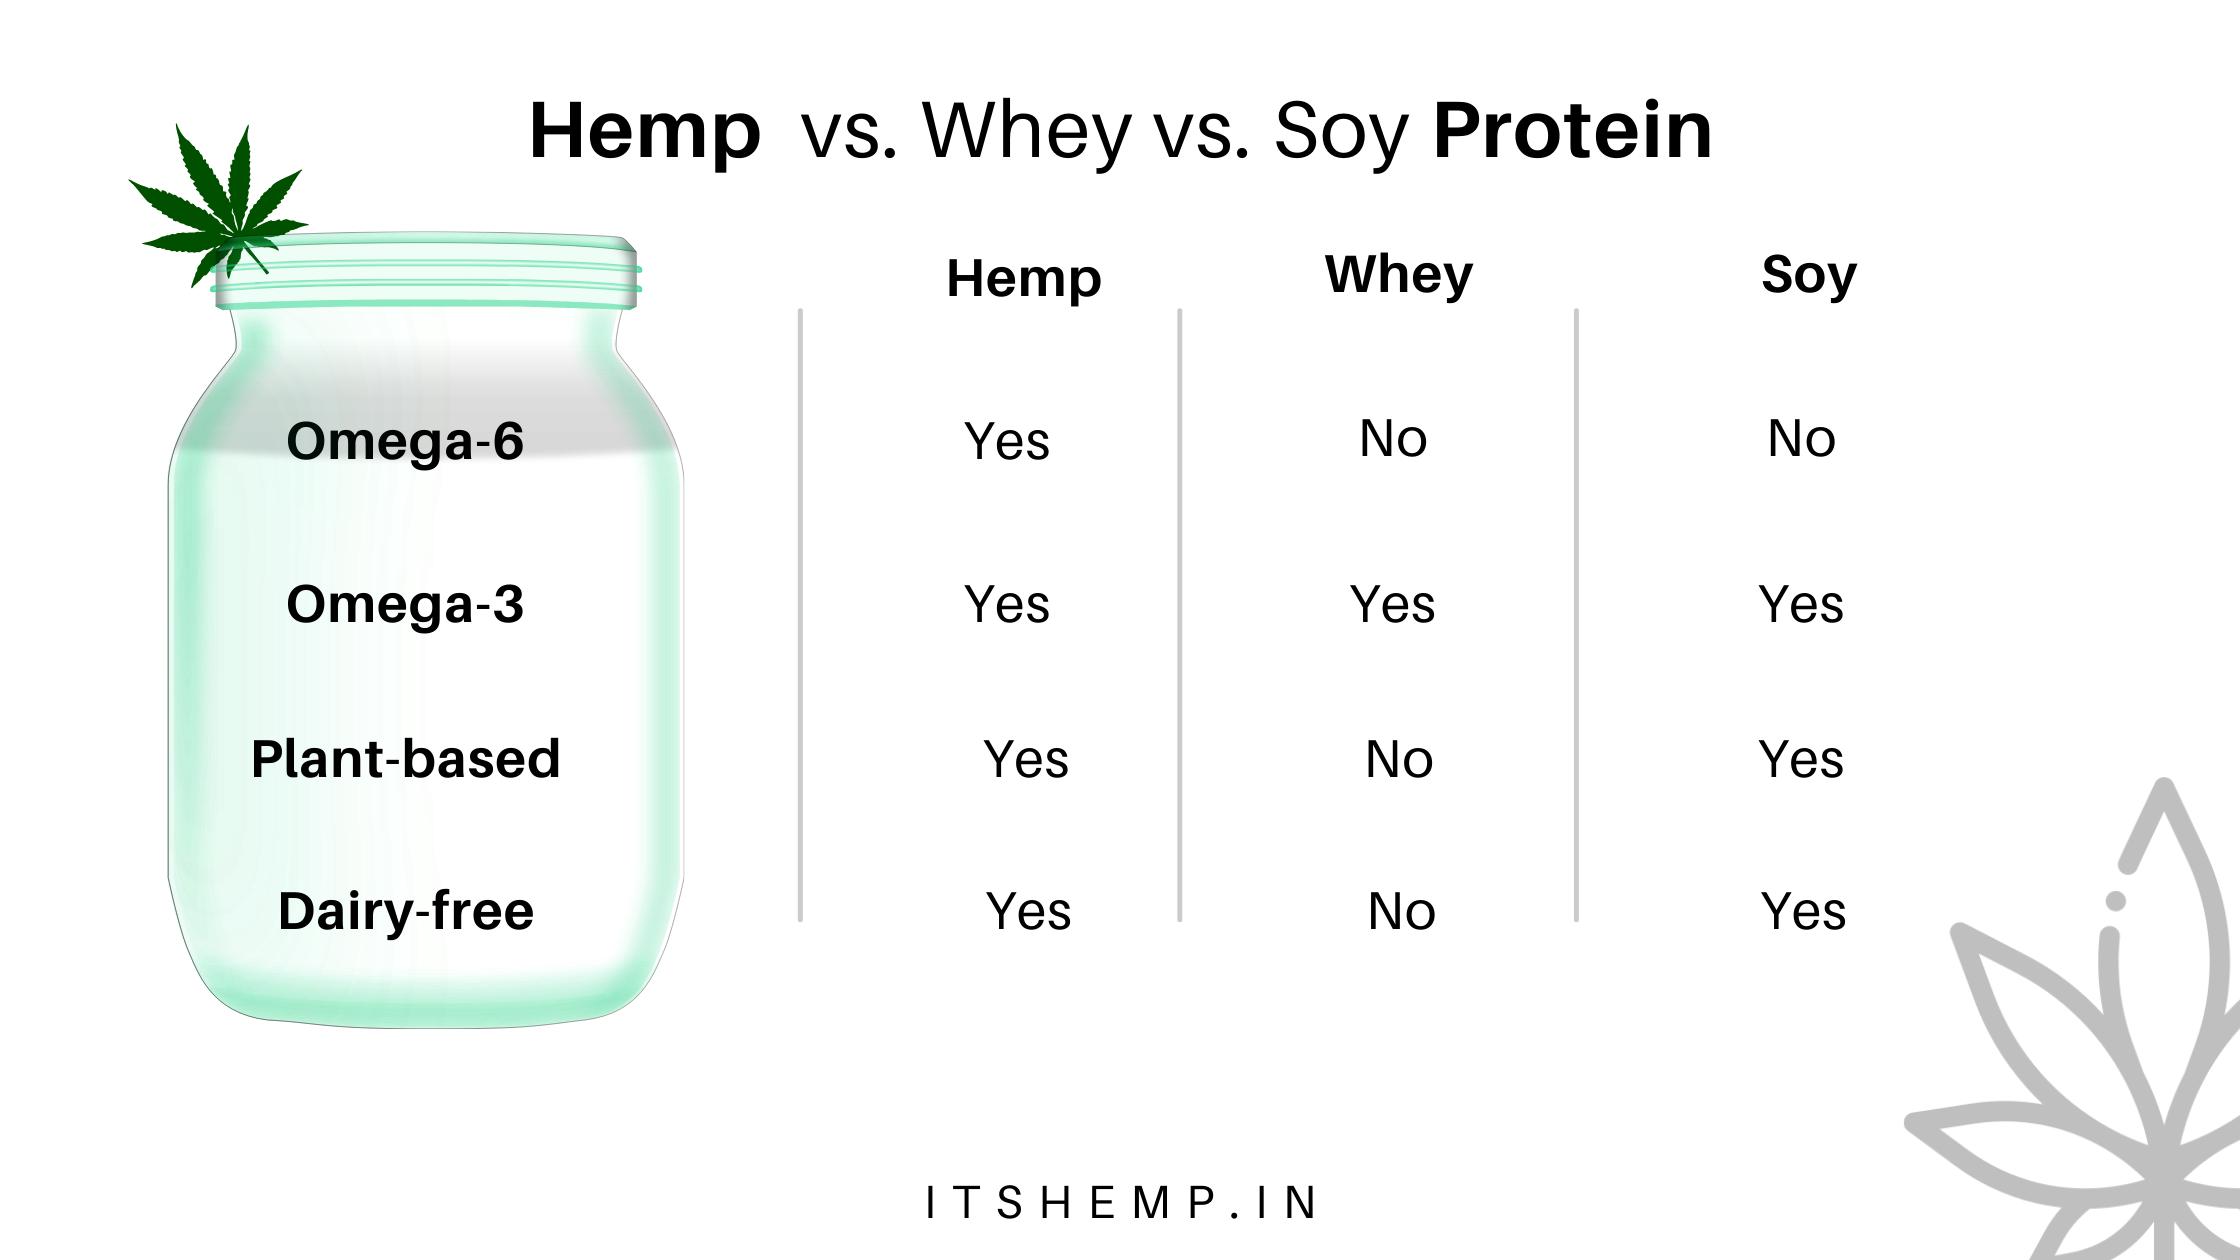 Hemp Seed Powder vs. Whey Protein vs. Soy Protein